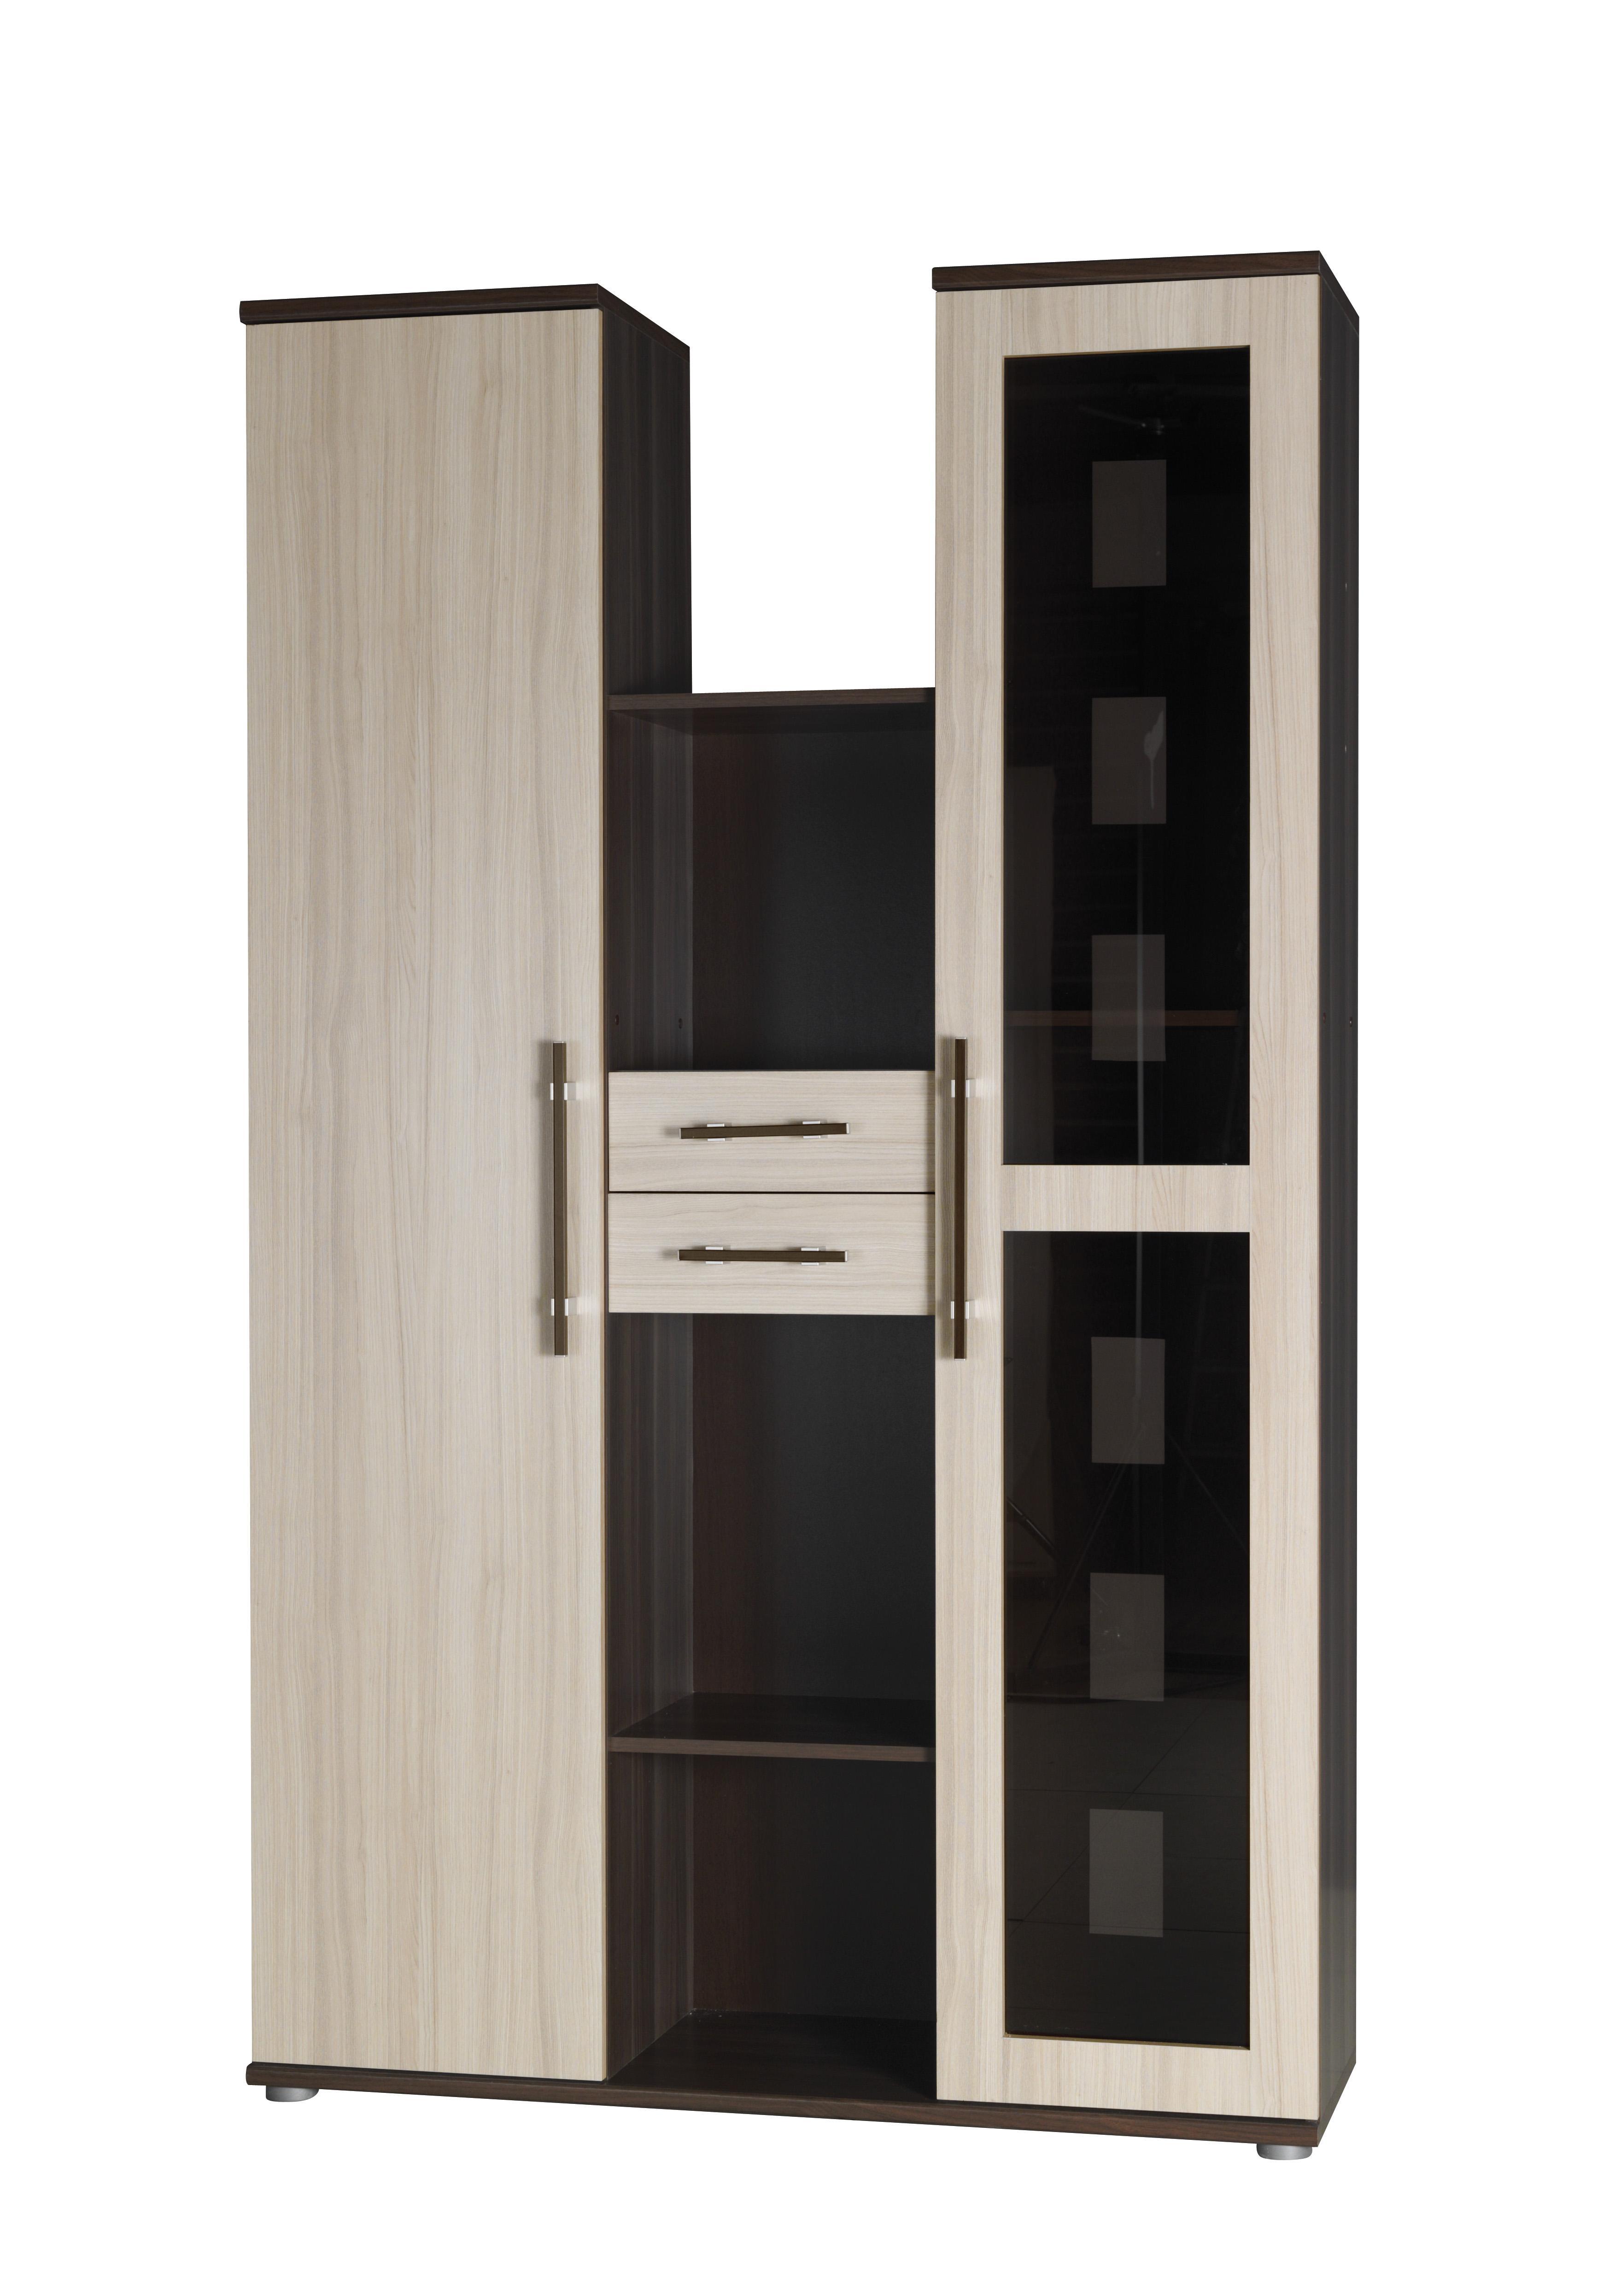 Vitrína - Irvine - I5 (jasan tmavý + jasan)